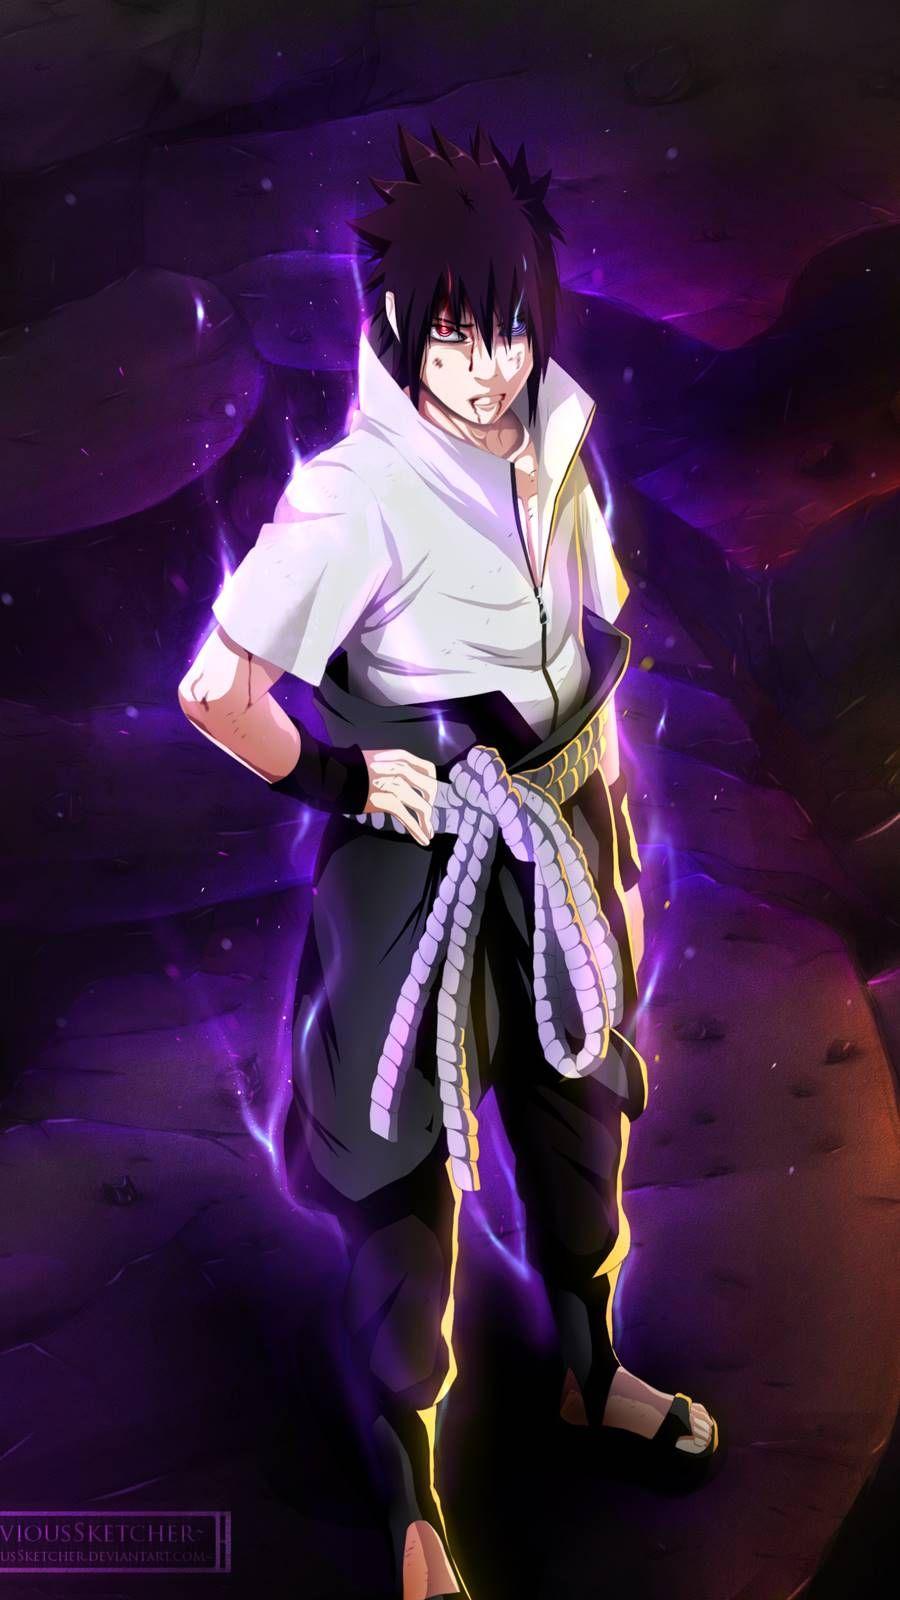 Sasuke Uchiha Para Celular With Images Naruto And Sasuke